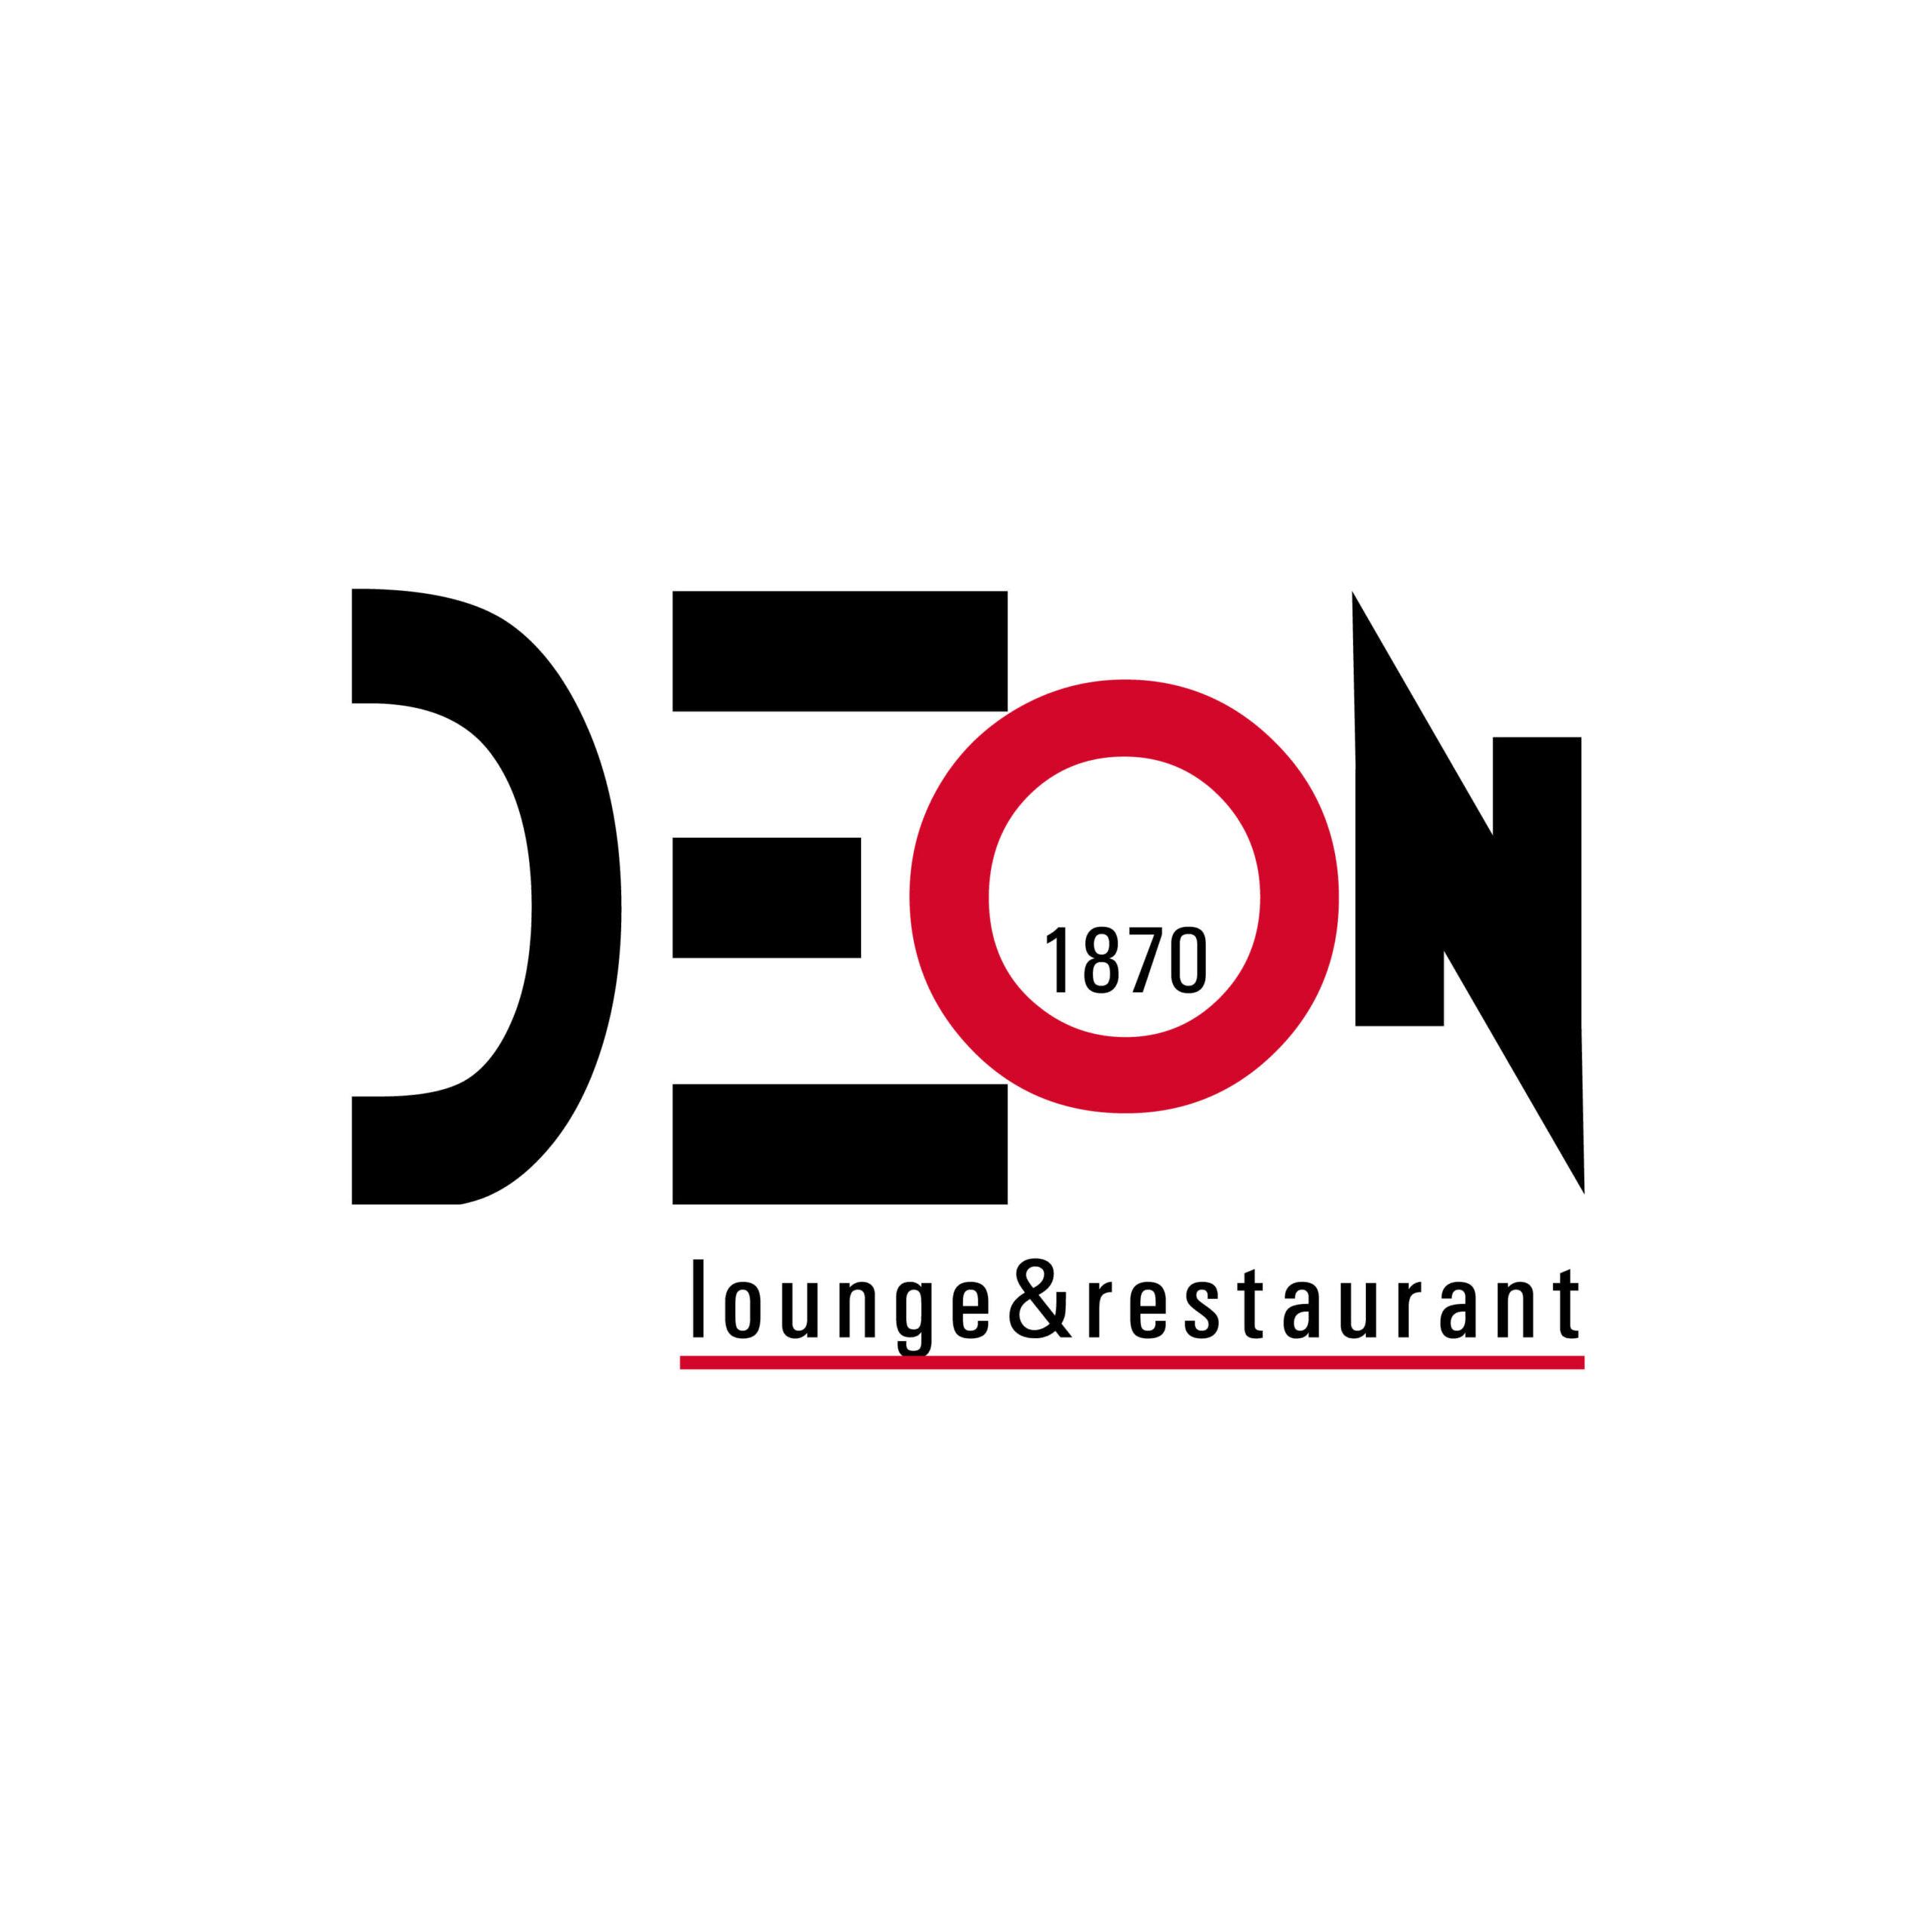 DEON lounge & restaurant